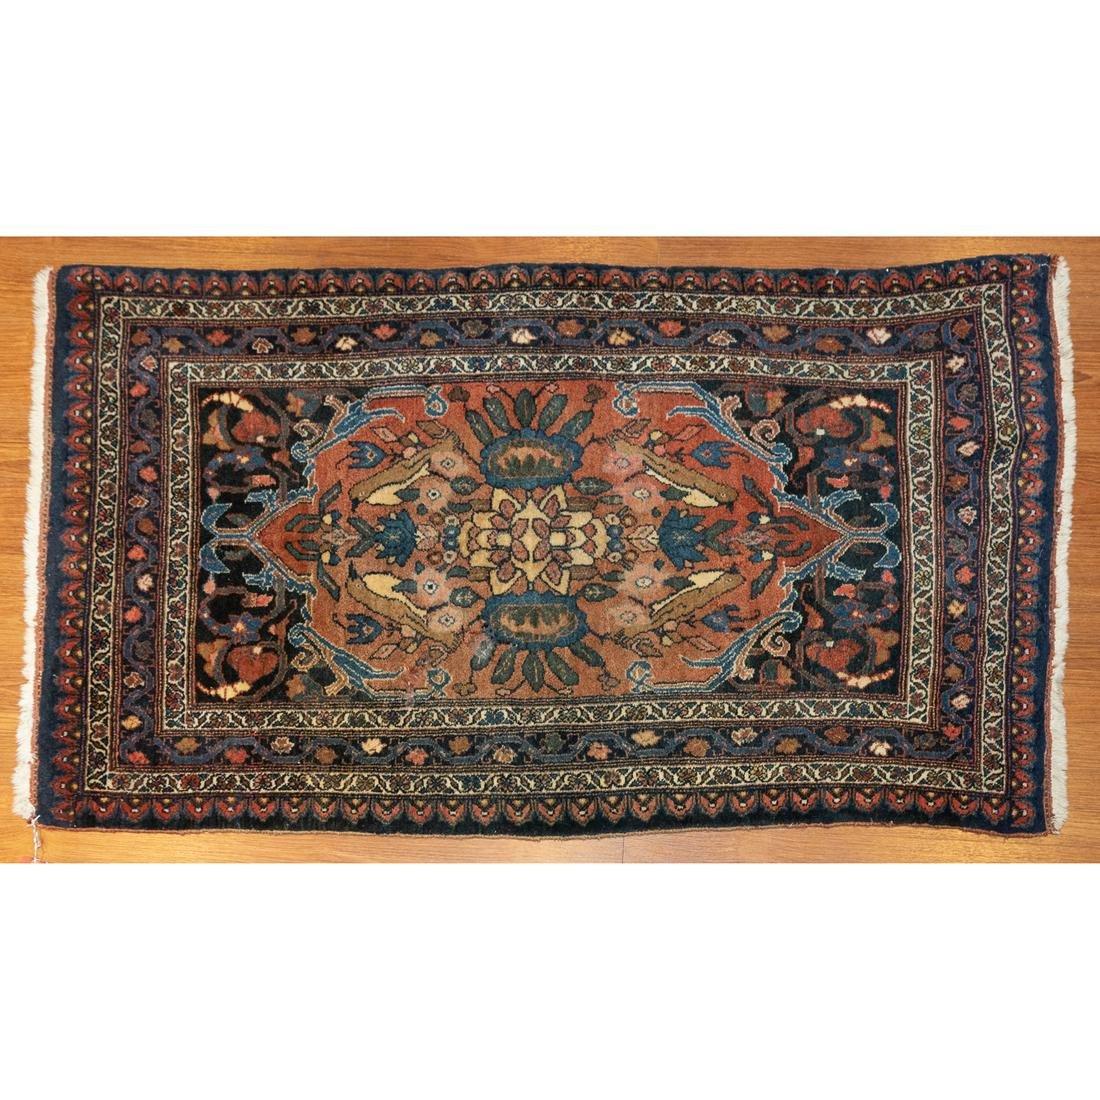 Semi-Antique Bijar Rug, Persia, 2.5 x 4.2